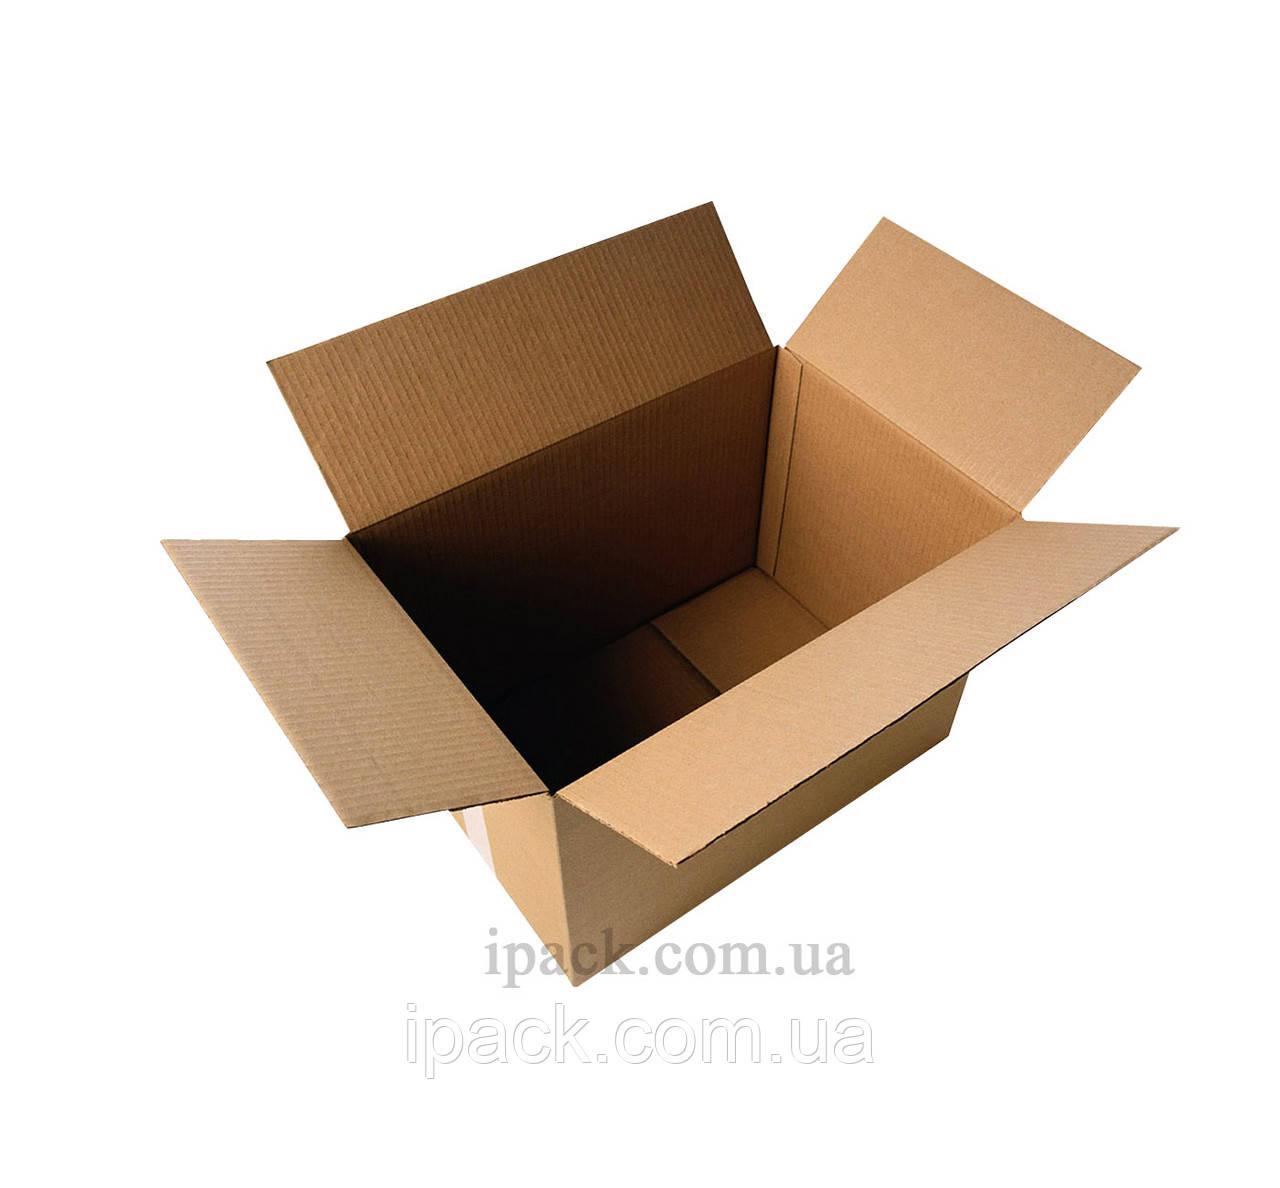 Гофроящик 160*155*290 мм, бурый, четырехклапанный картонный короб